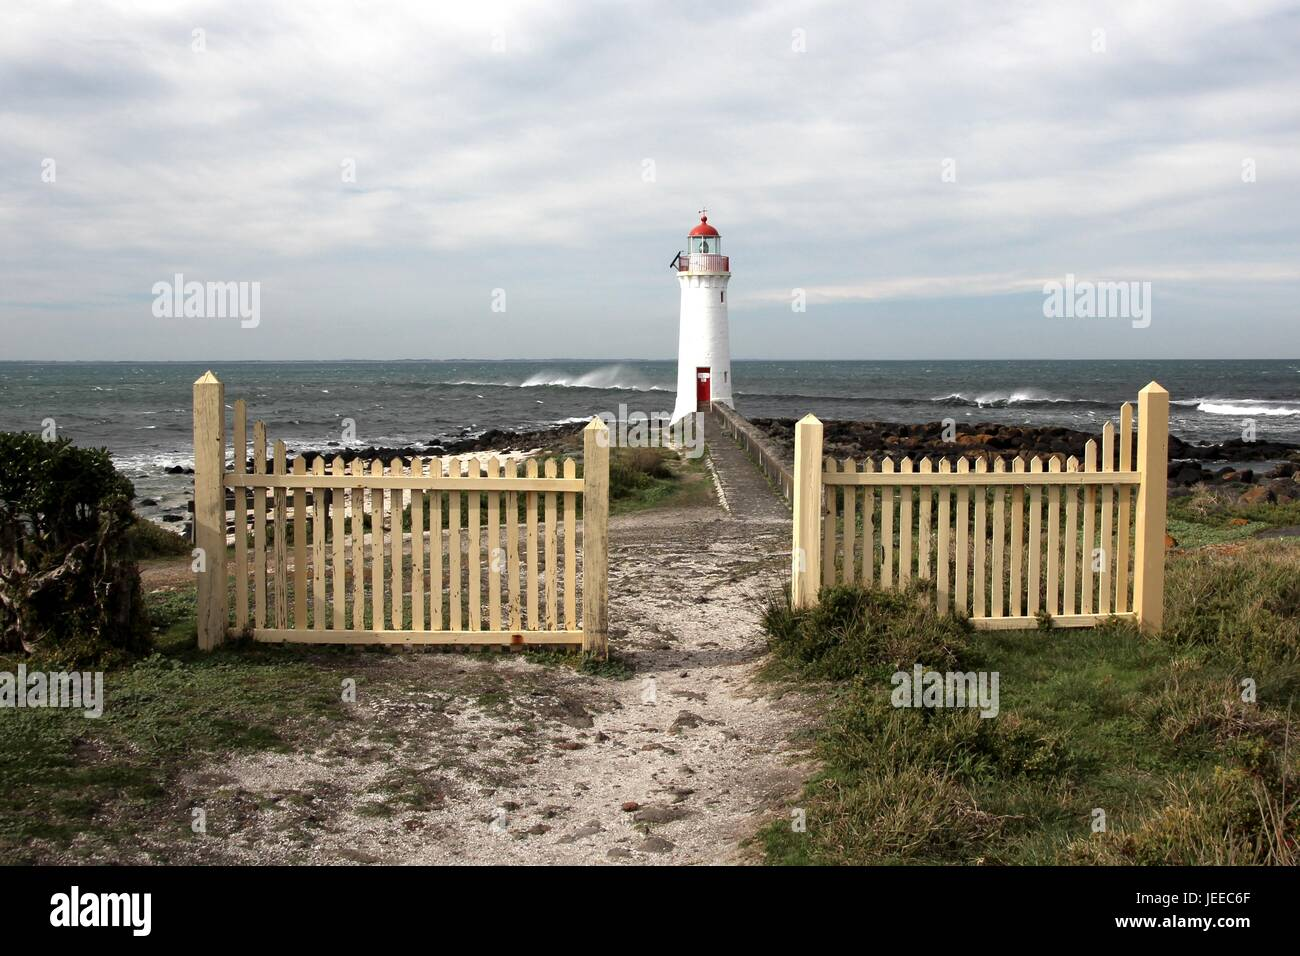 Port Fairy Leuchtturm auf Griffiths Insel Stockfoto